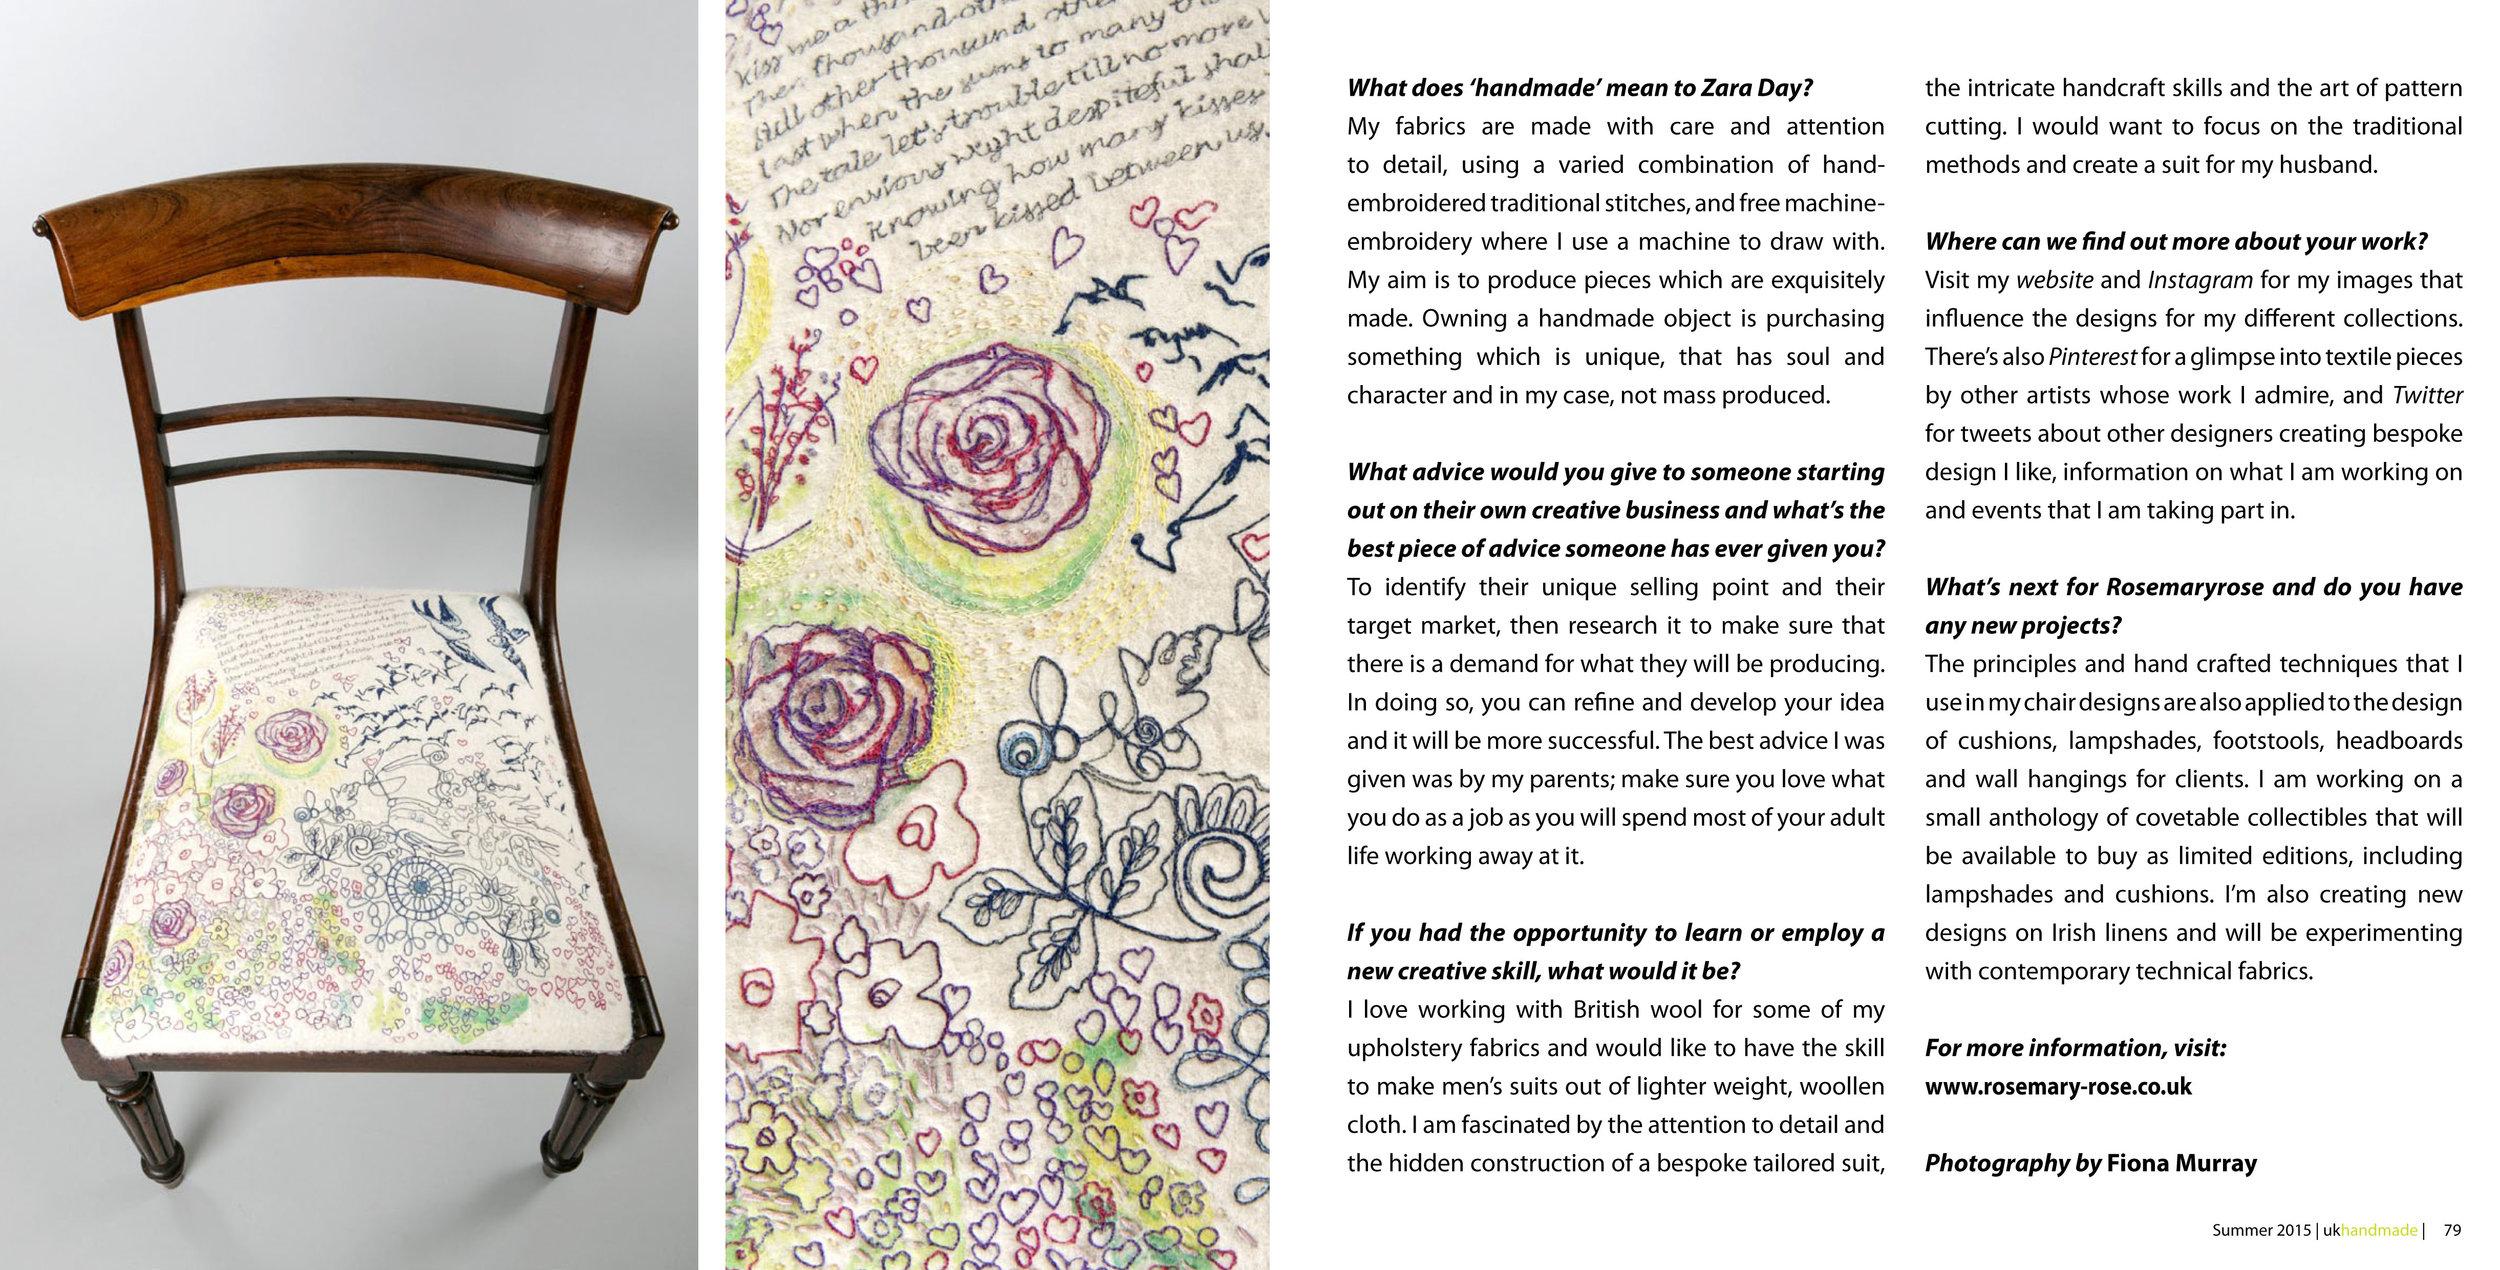 Zara Day UK HANDMADE SUMMER  2015-7.jpg